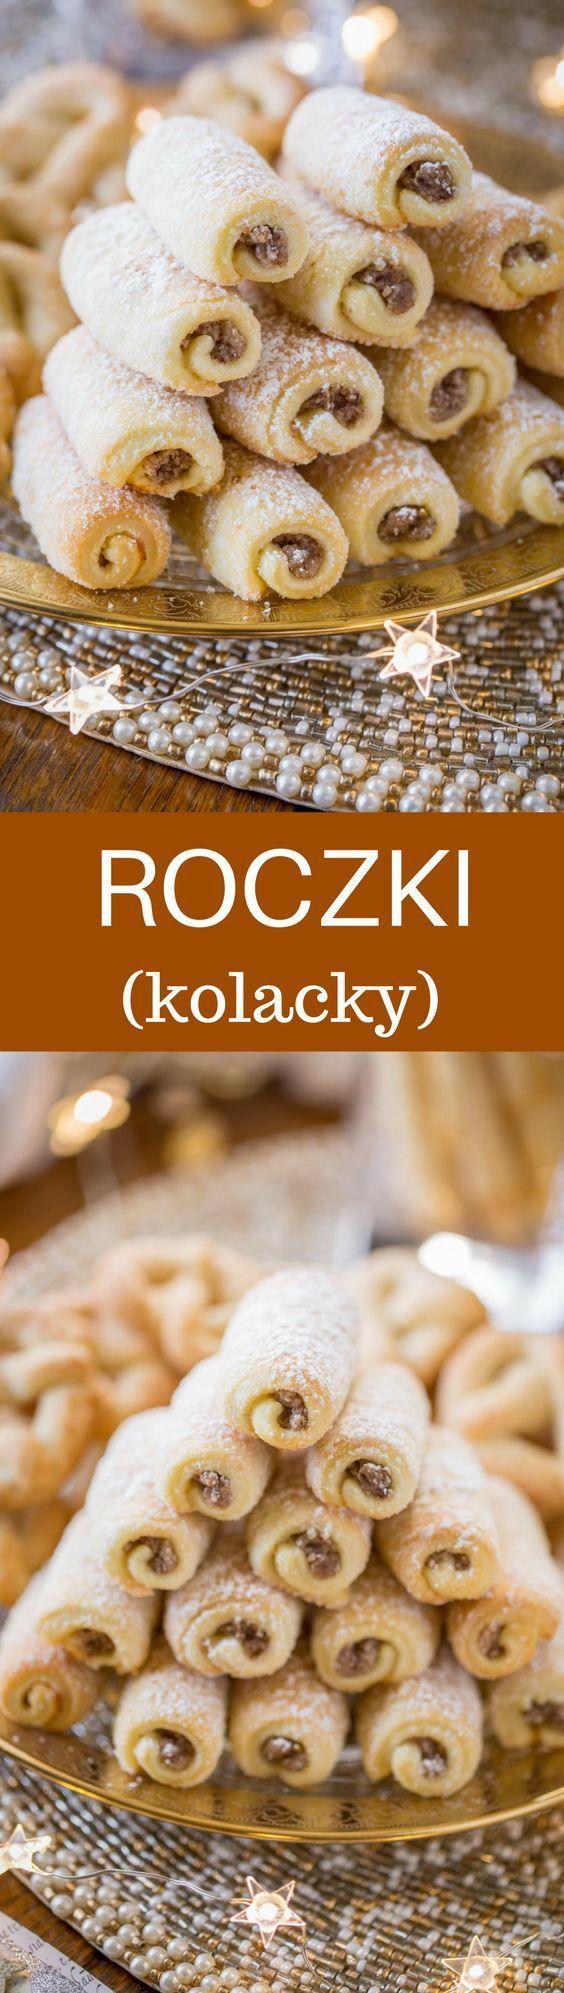 872 best polish food images on pinterest ukrainian food ukrainian roczki kolacky polish dessertspolish foodpolish recipespolish forumfinder Image collections